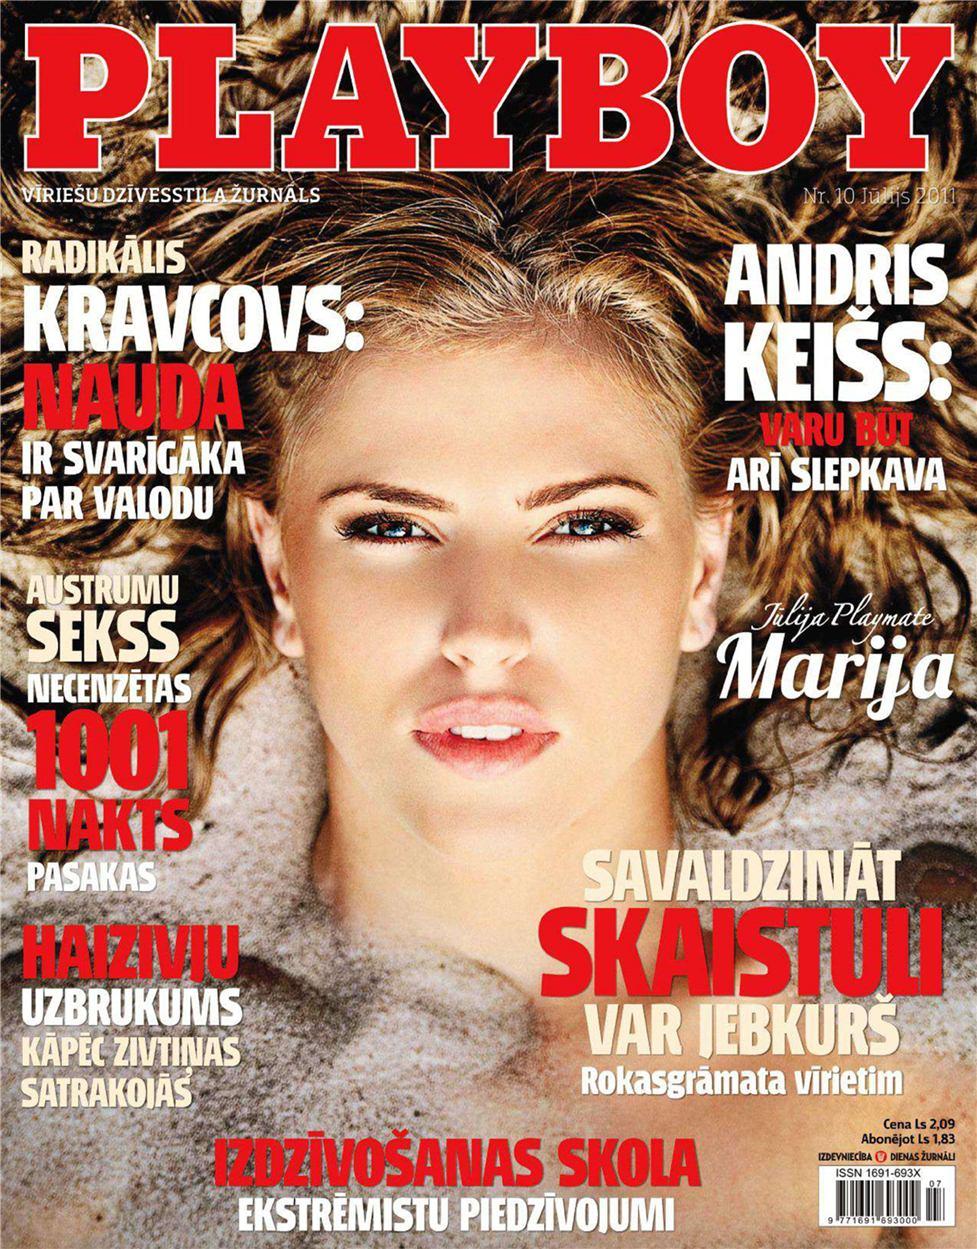 Мария Алашина / Marija Alasina in Playboy Latvia july 2011